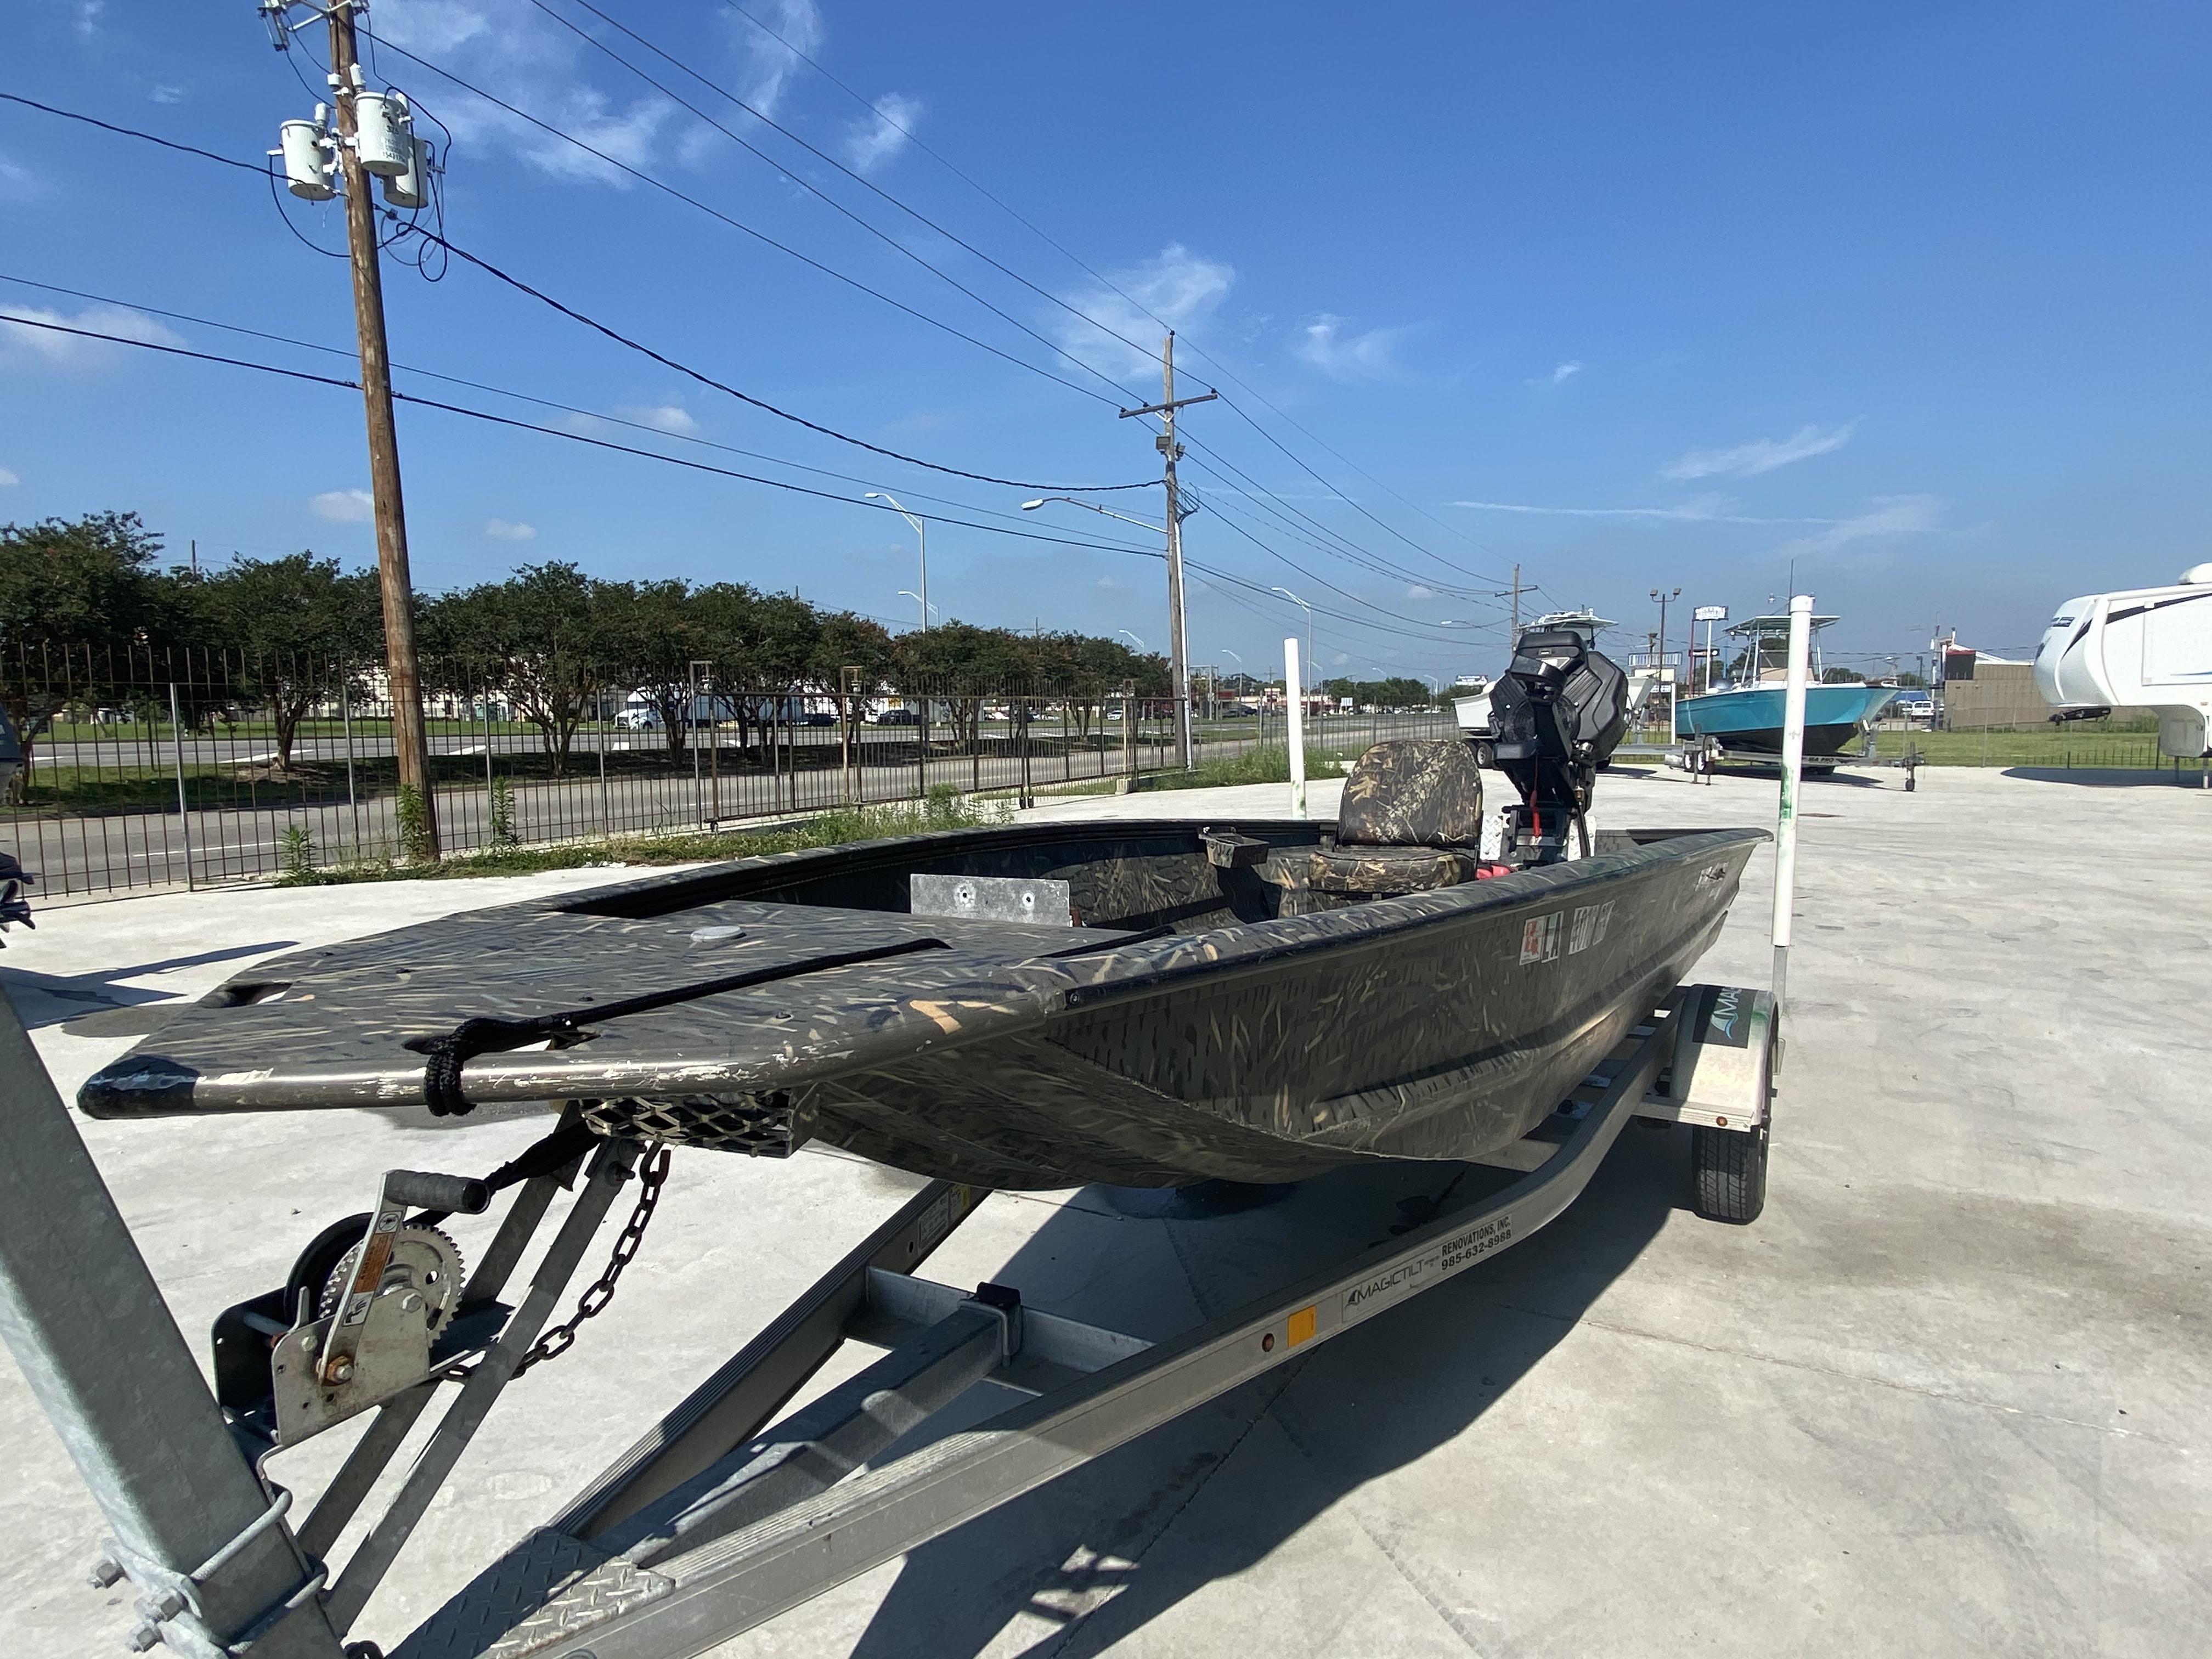 2020 War Eagle boat for sale, model of the boat is Gladiator 750 & Image # 6 of 11